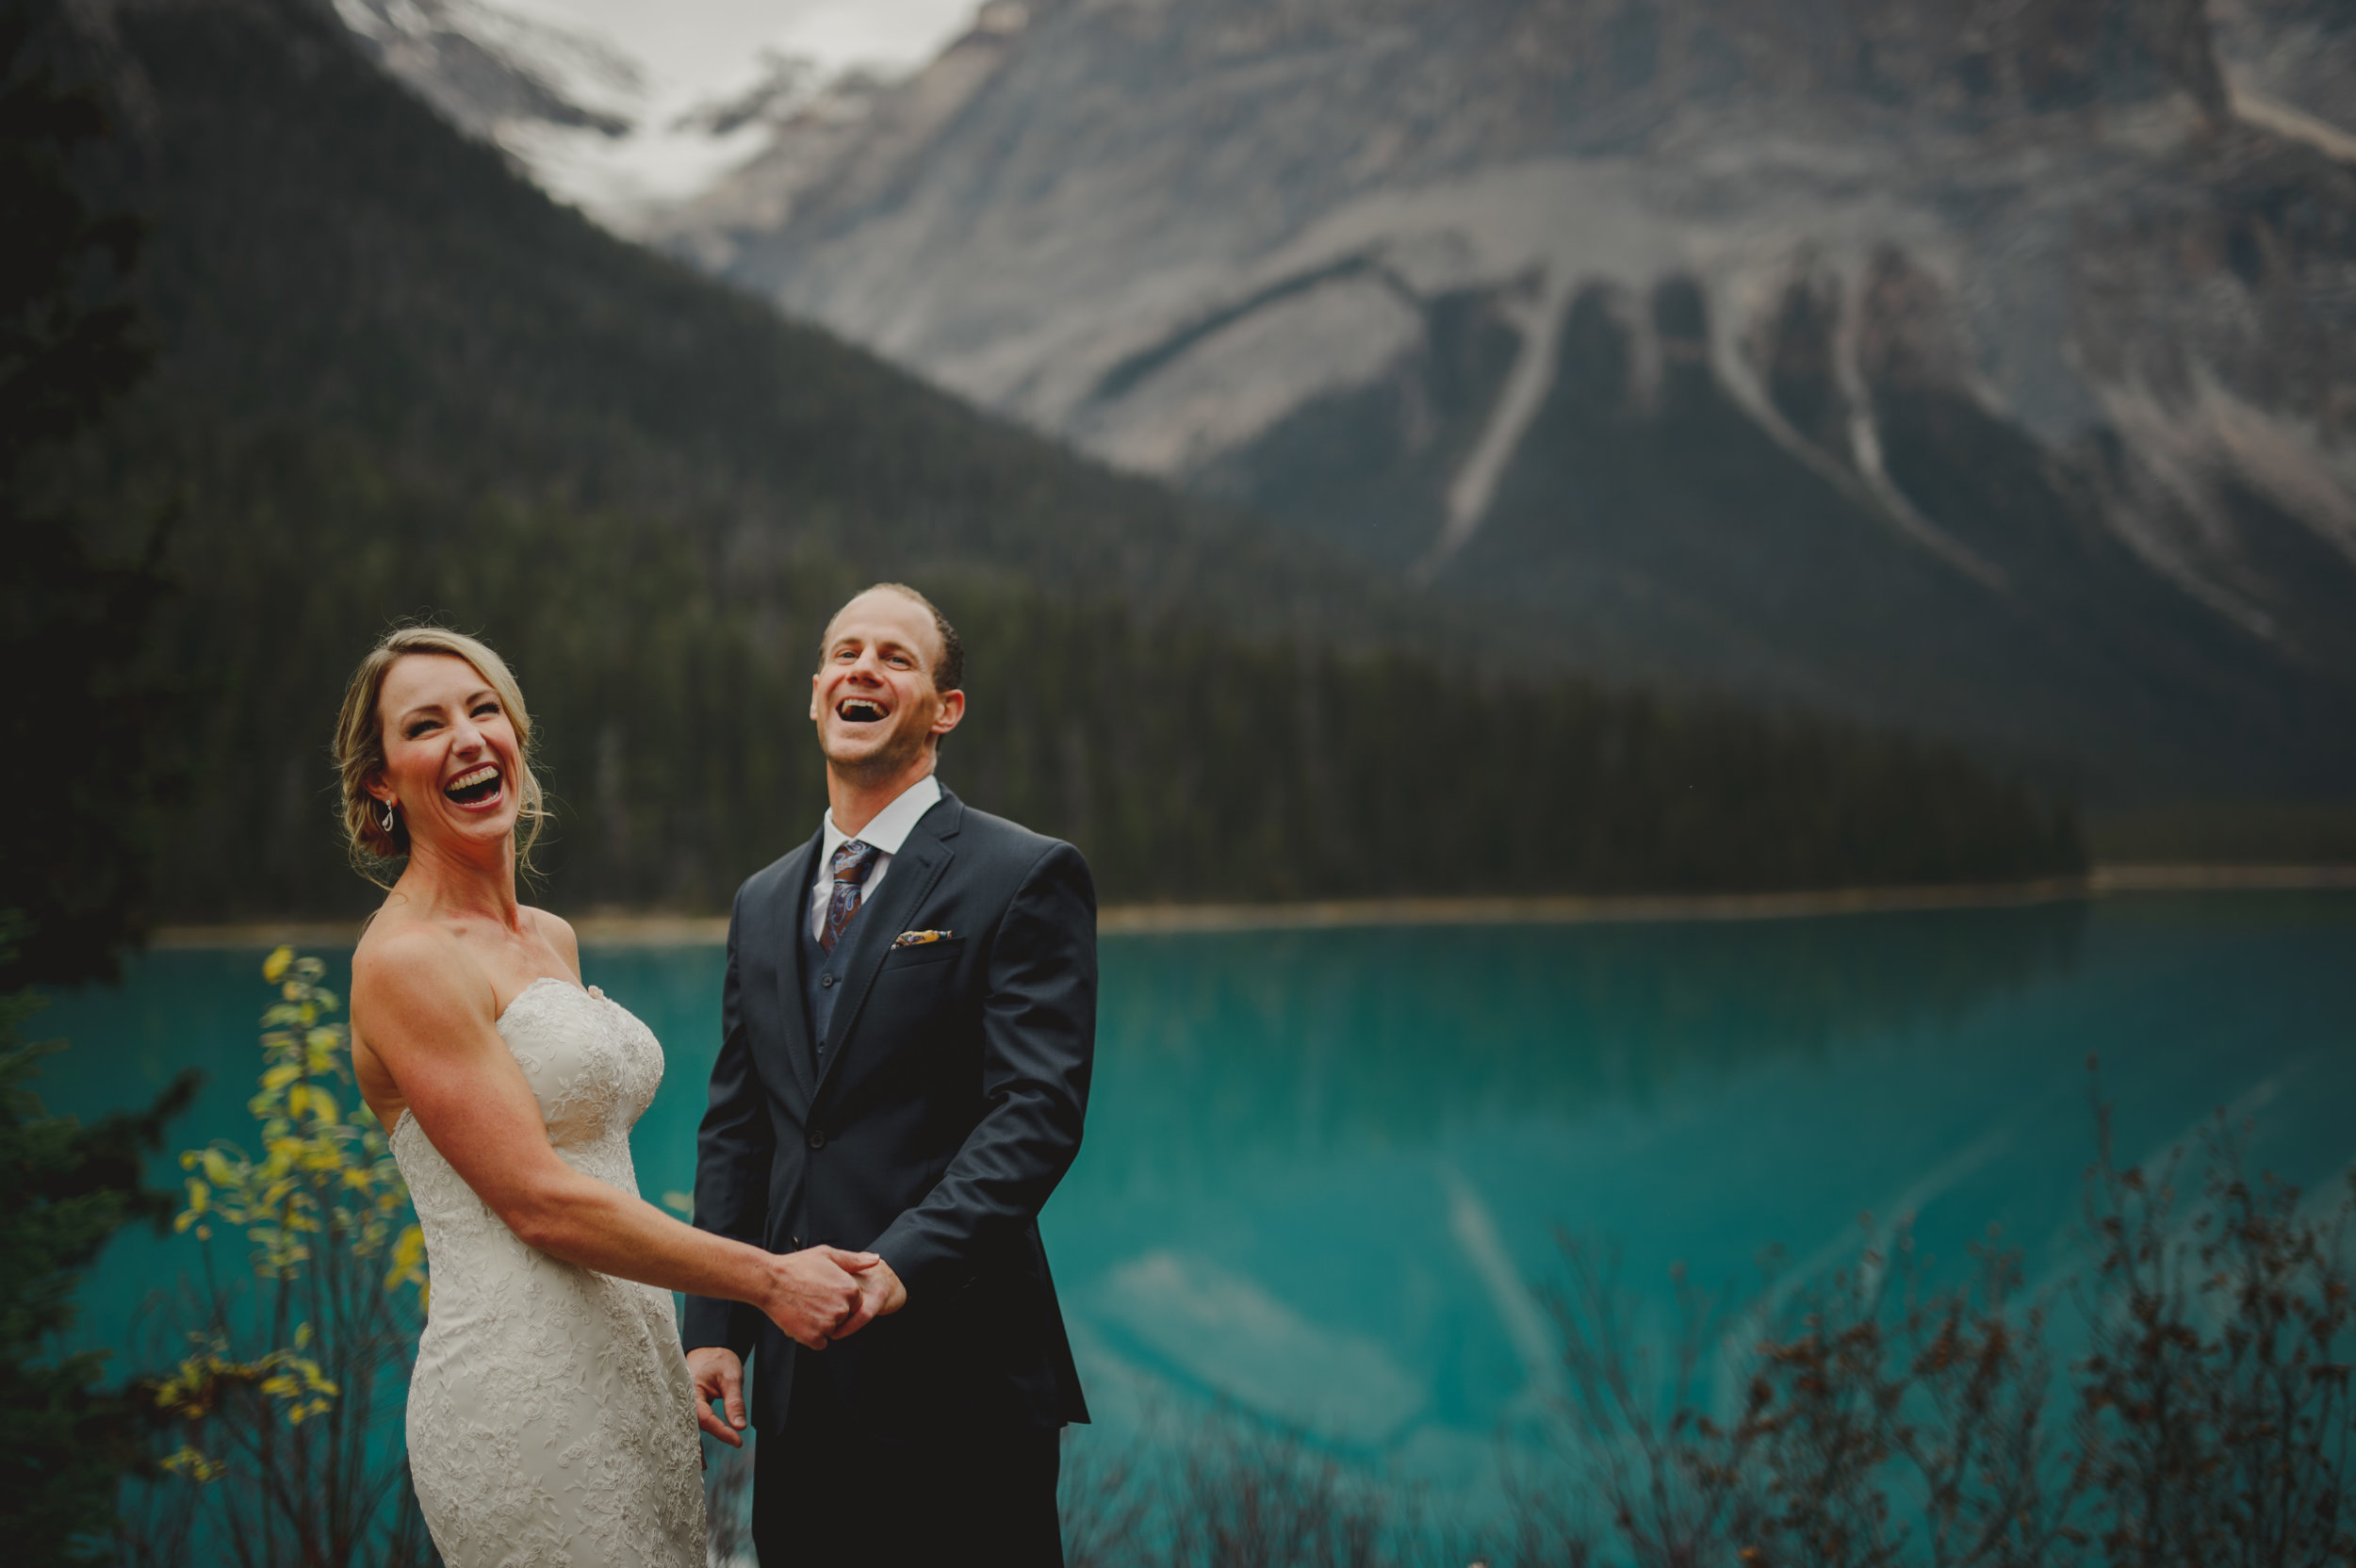 Banff-Wedding-Photographer-11.jpg